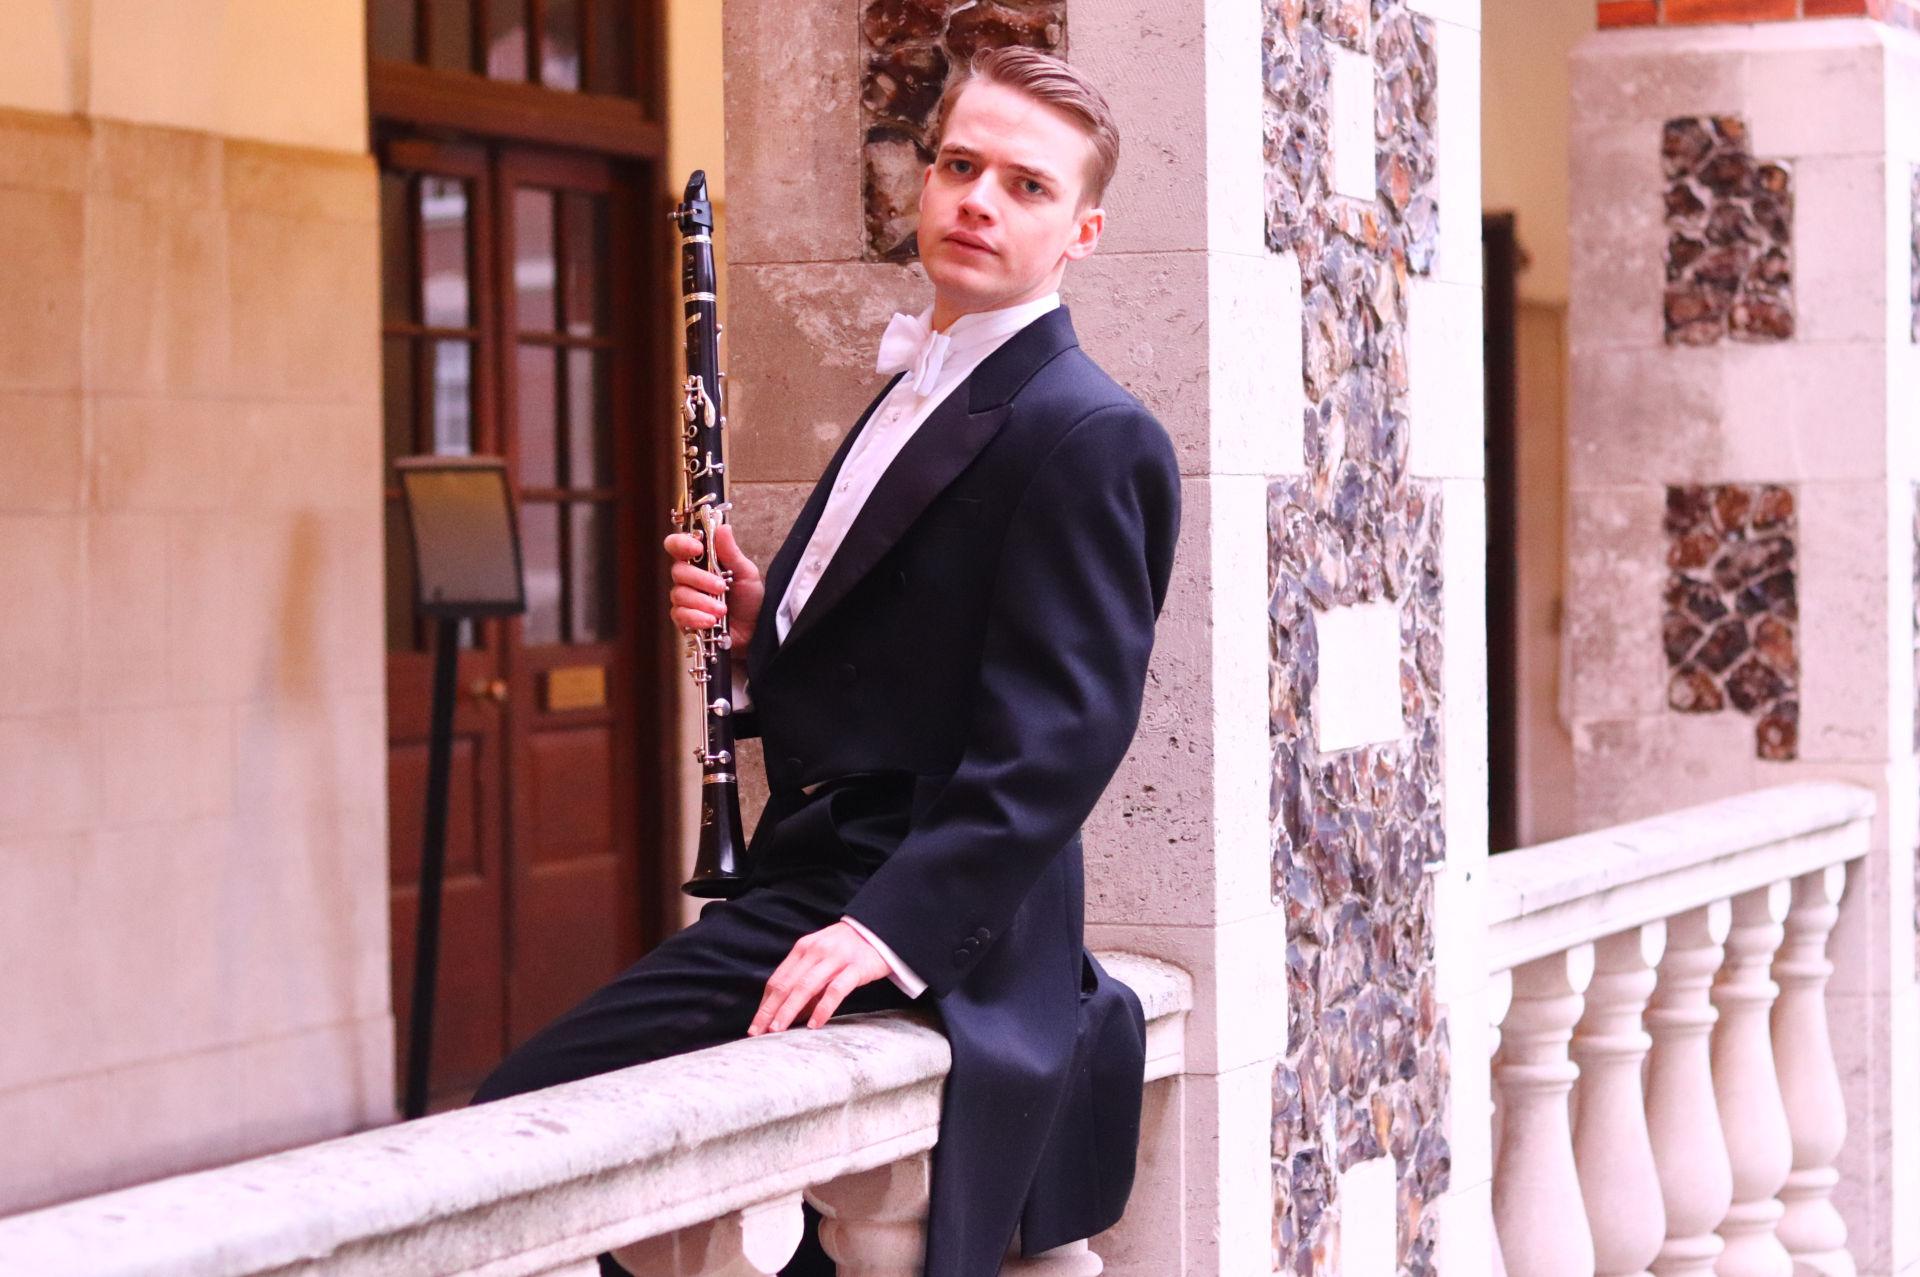 Sacha, Clarinet Soloist